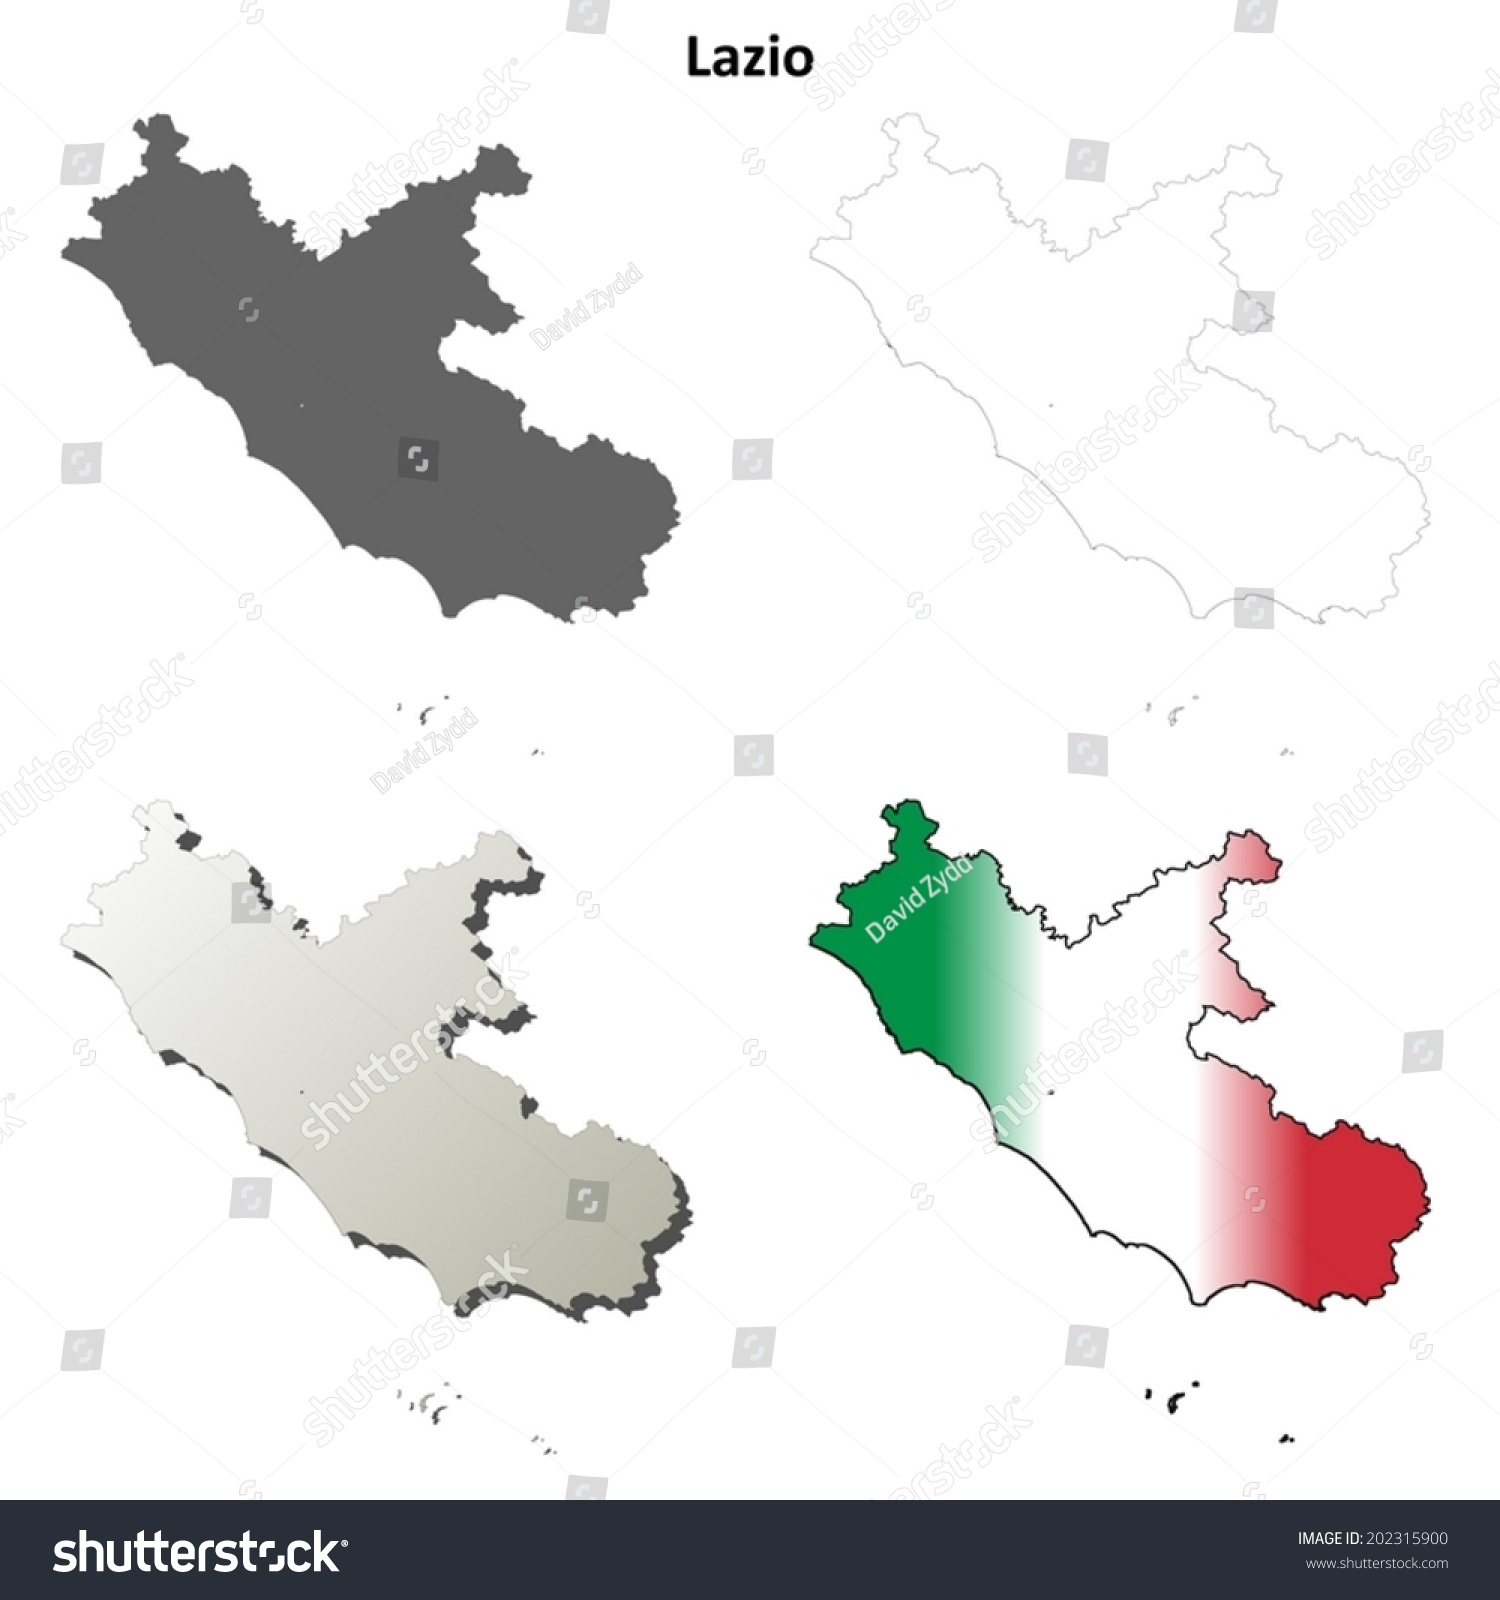 Lazio Blank Detailed Outline Map Set Stock Photo Photo Vector